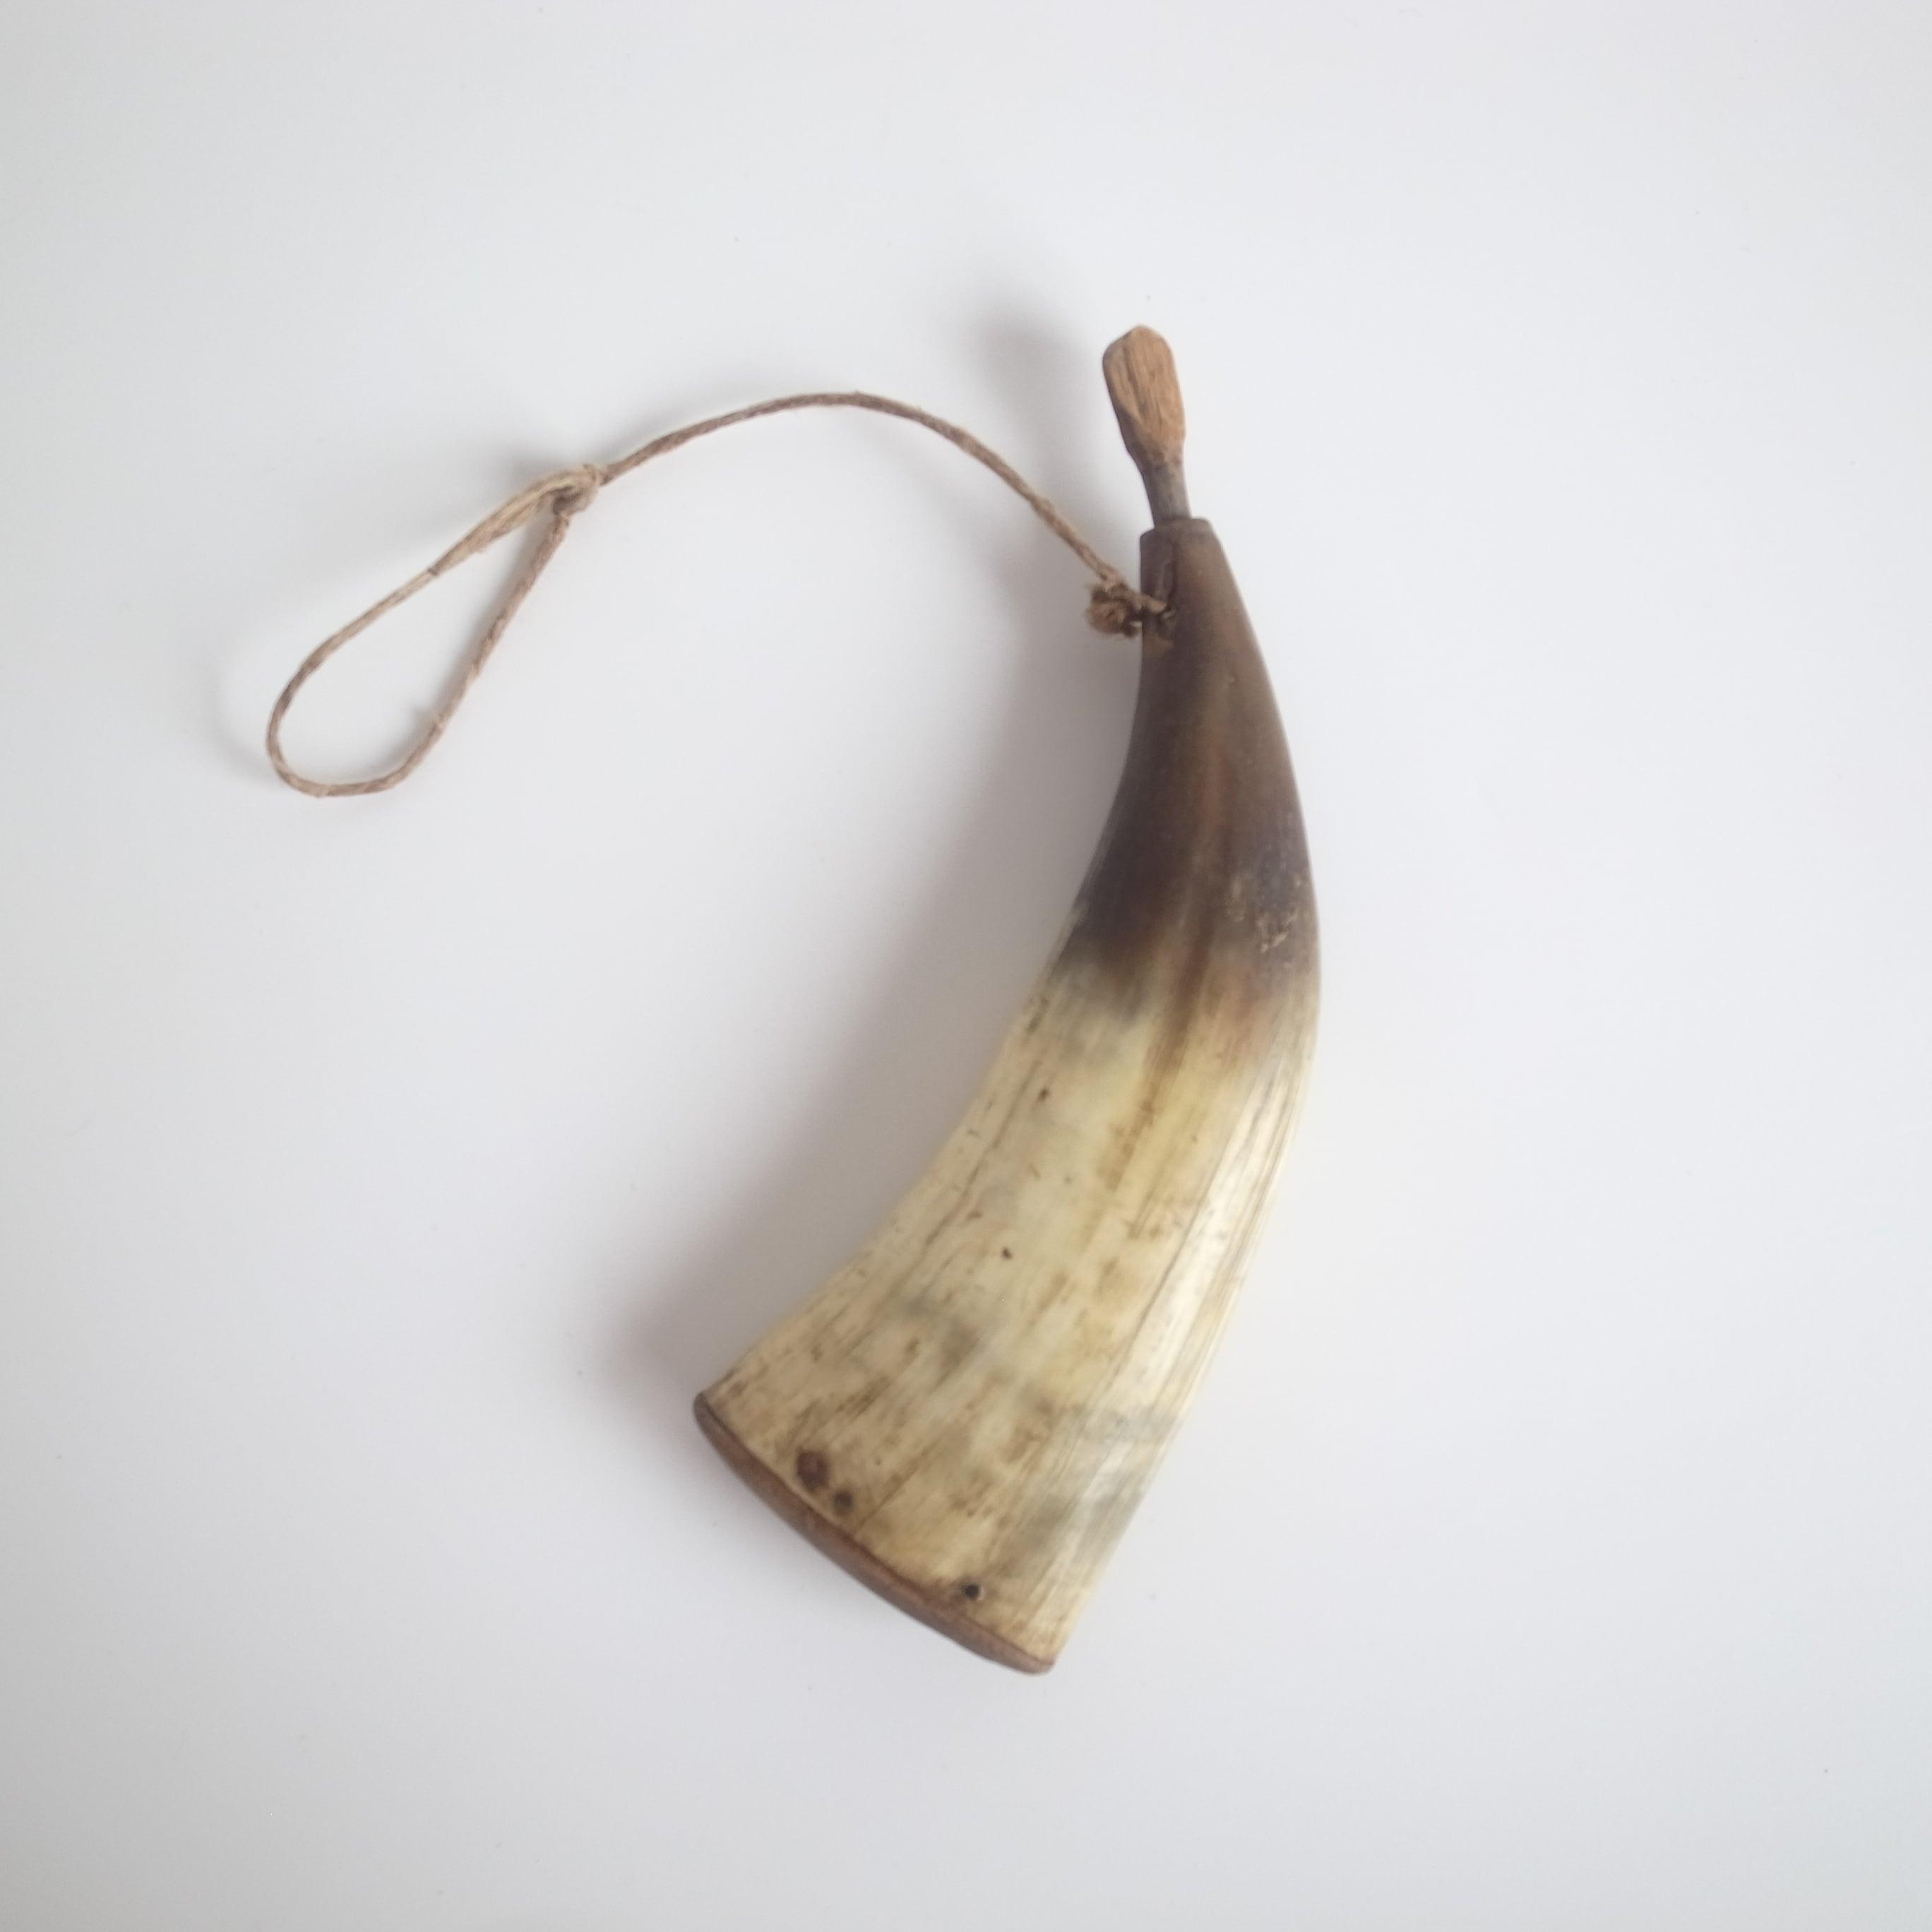 Horn powder flask